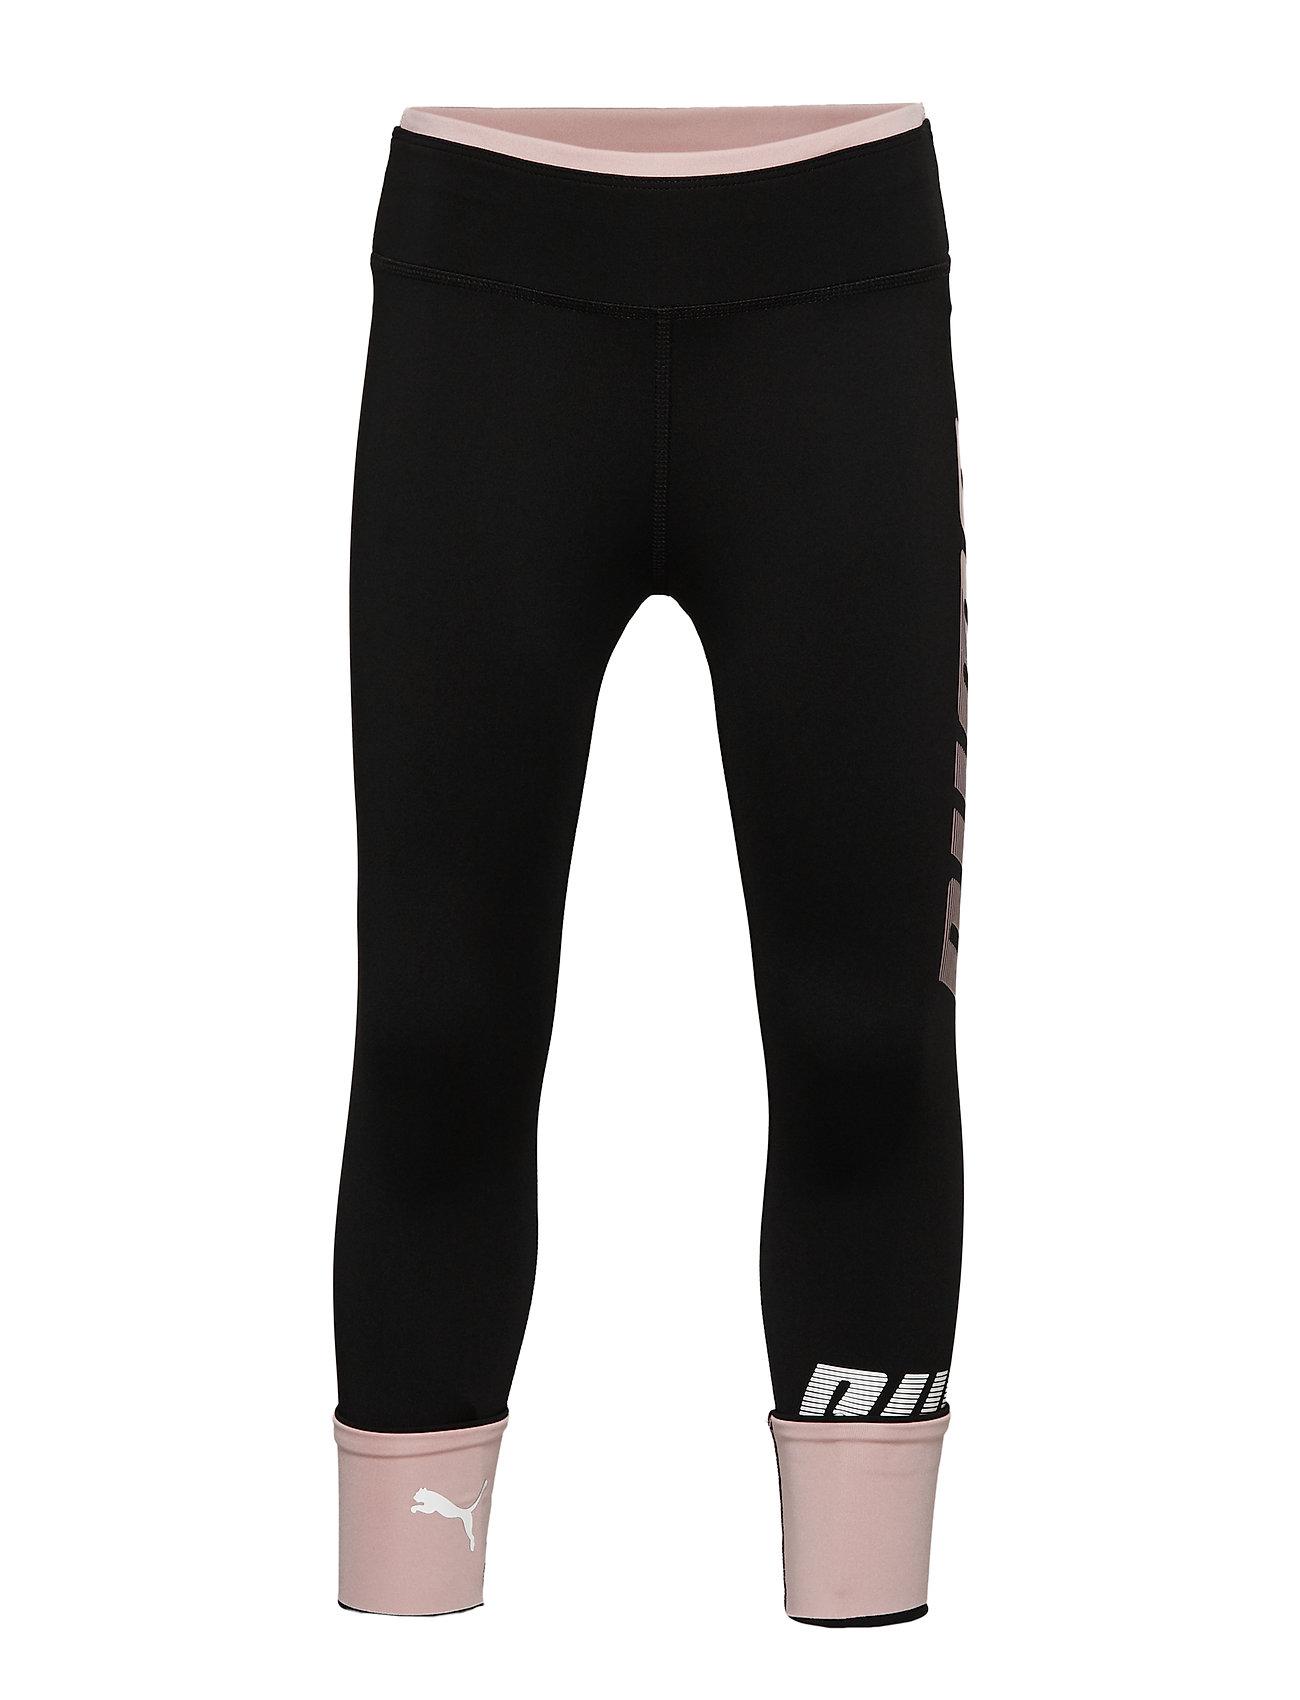 PUMA Modern Sport Leggings G - PUMA BLACK-BRIDAL ROSE